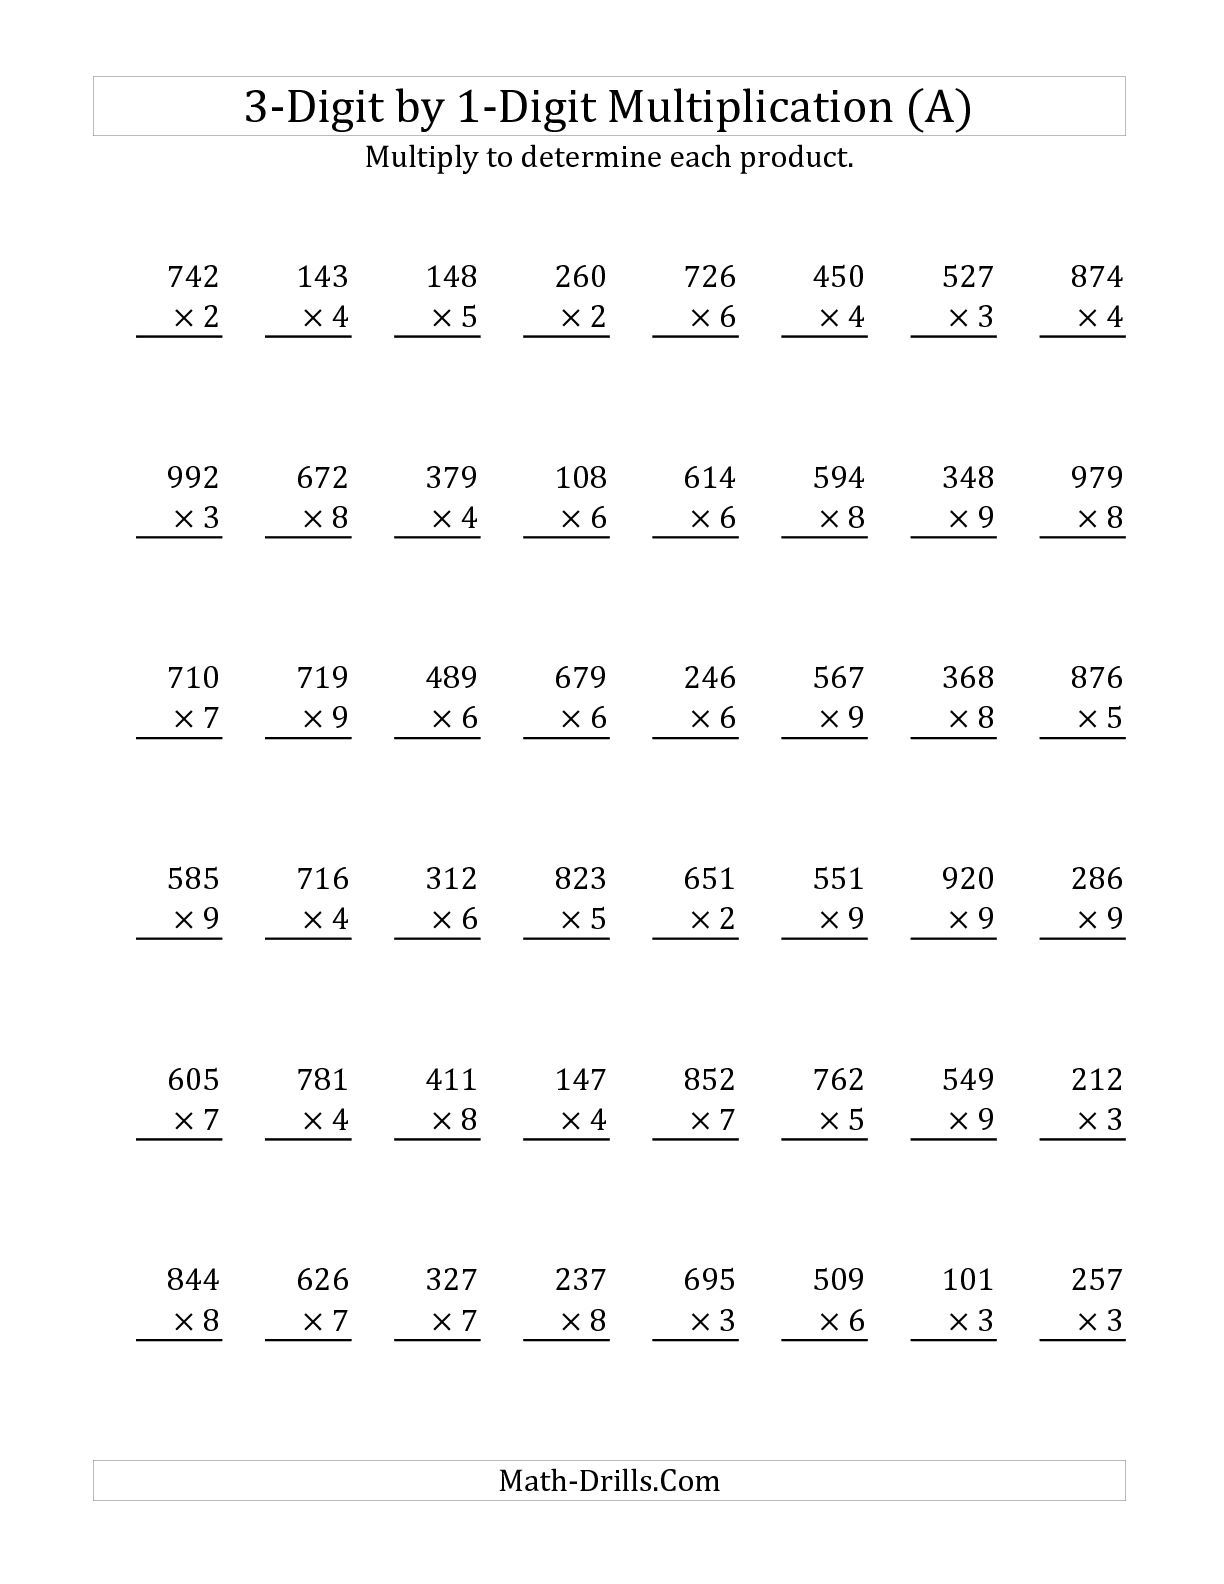 3-Digit1-Digit Multiplication (A) Math Worksheet pertaining to Printable Long Multiplication Worksheets